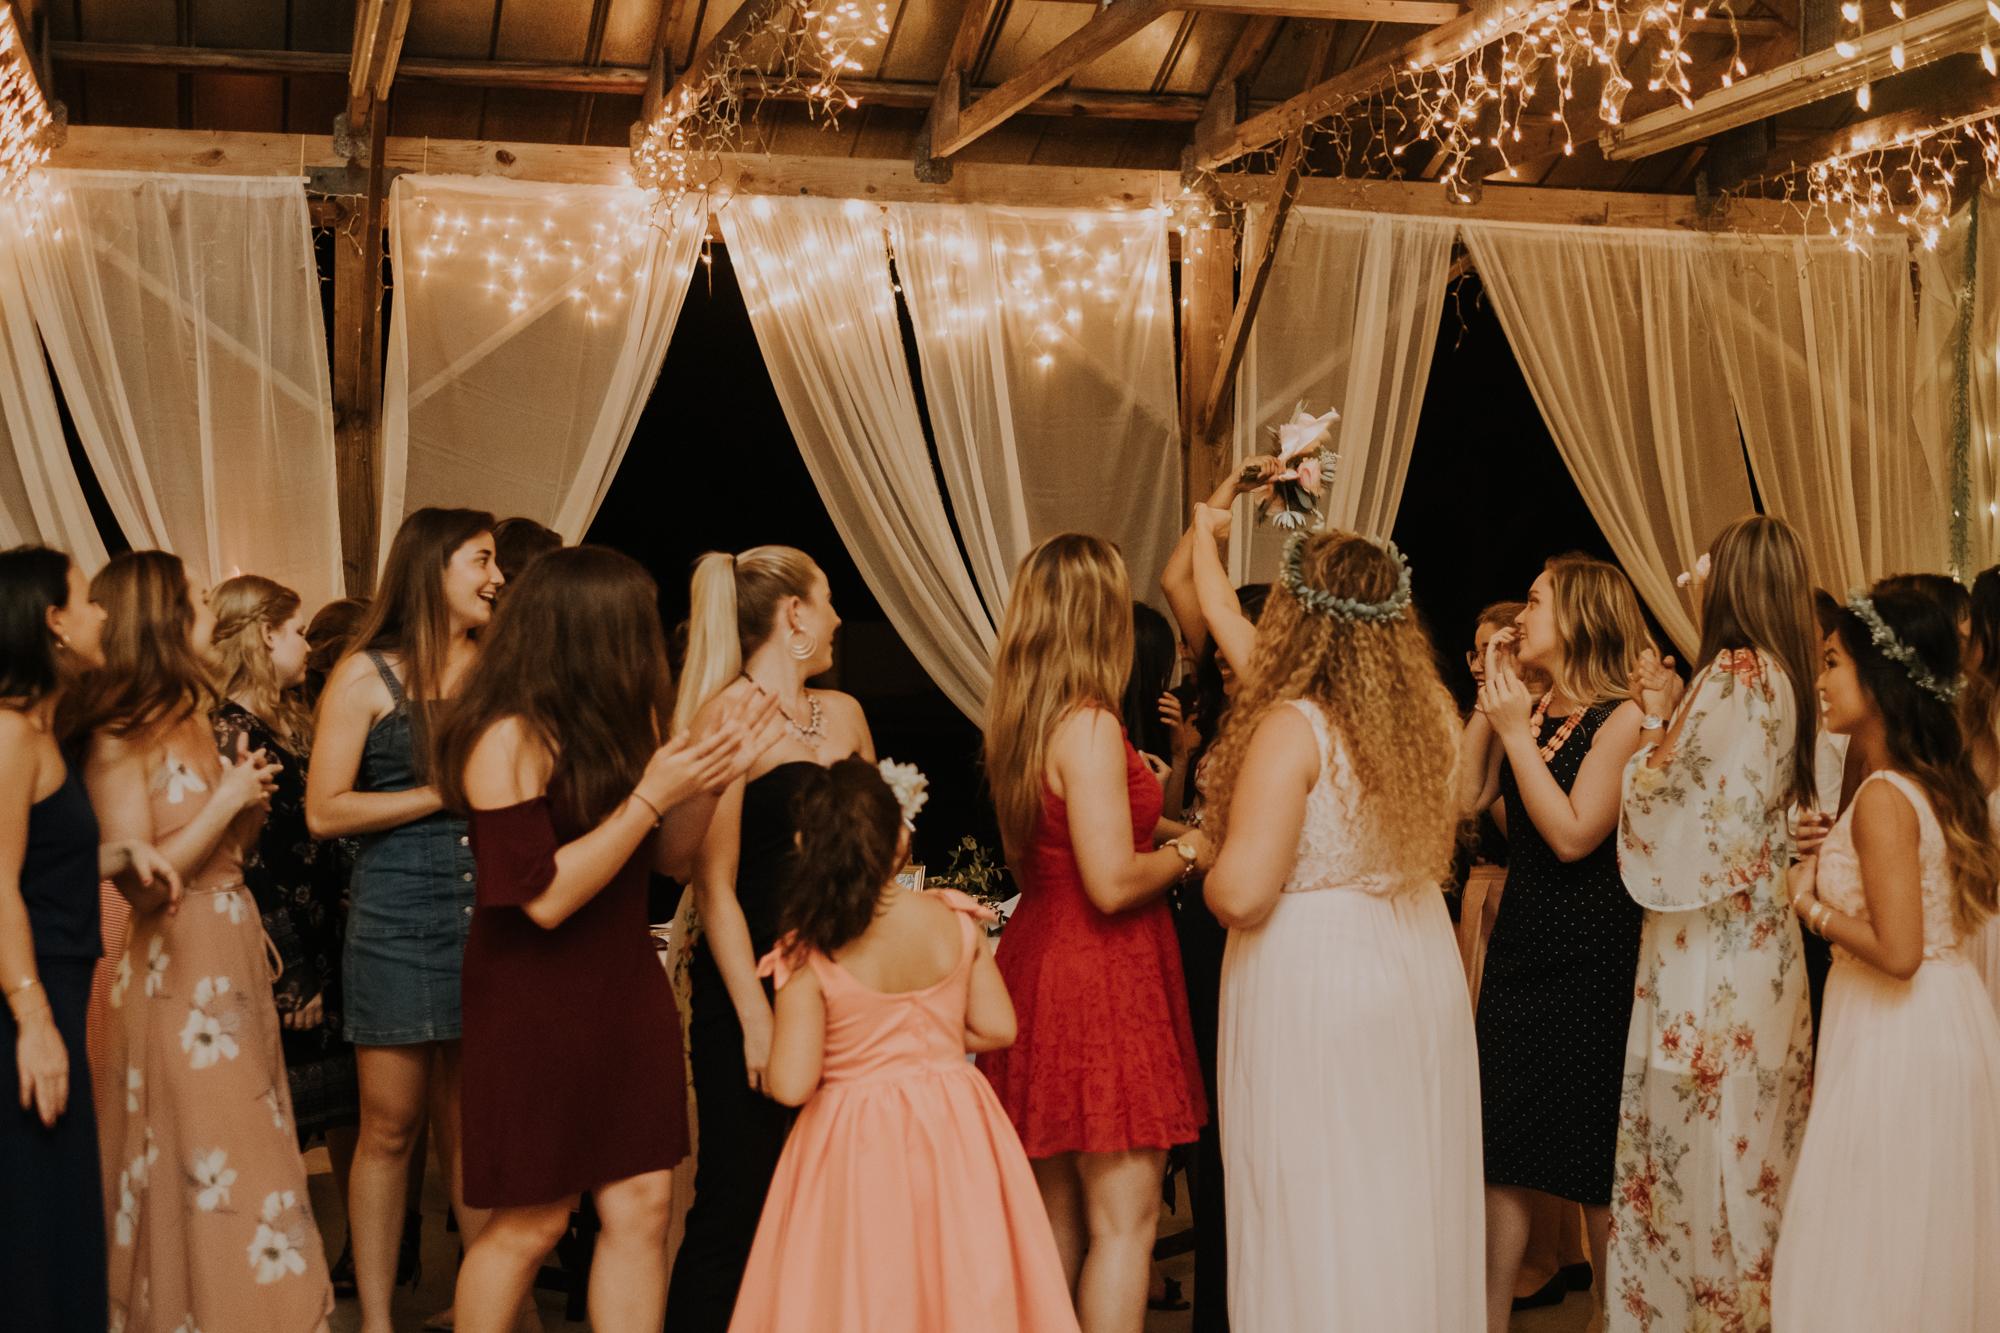 bouquet toss | boho bouquet toss | boho wedding reception | Florida wedding | romantic sarasota wedding